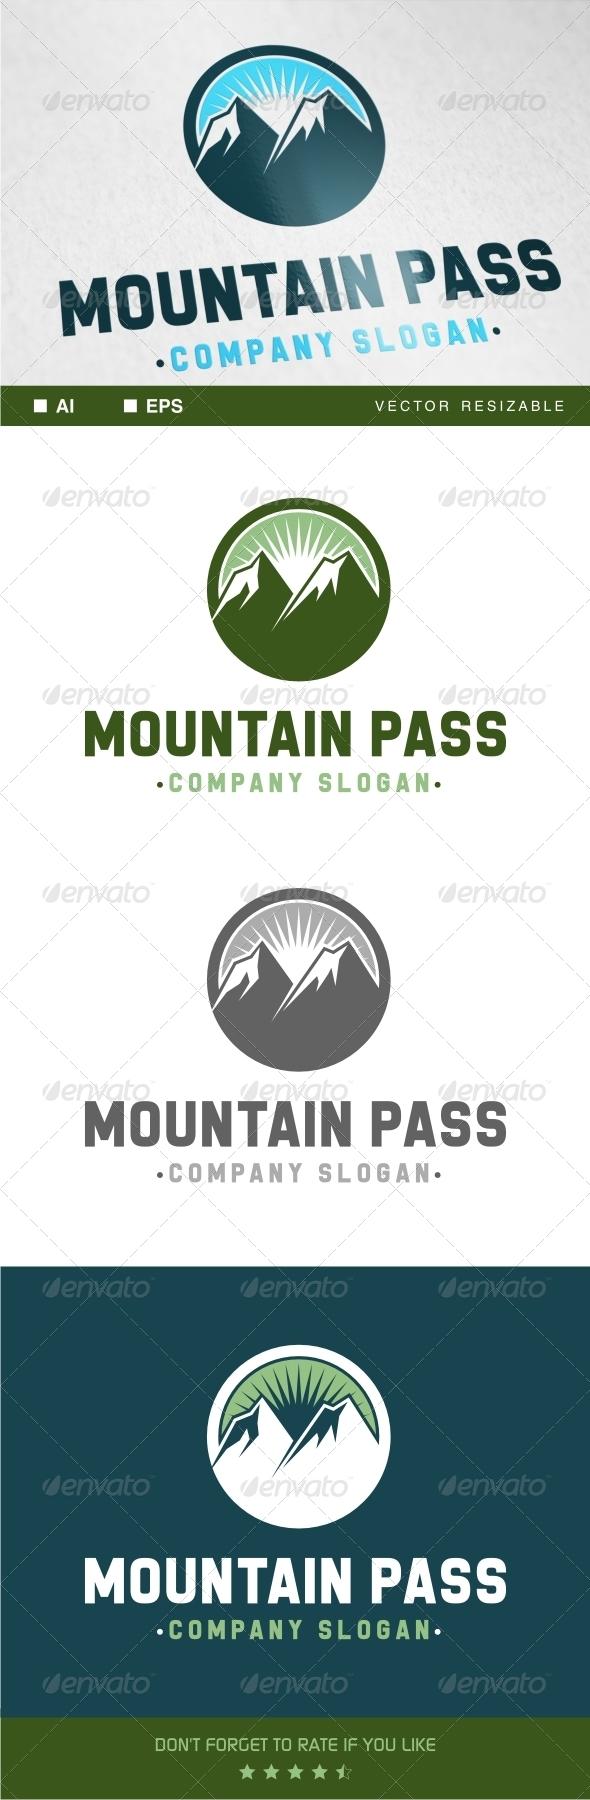 Mountain Pass Logo - Nature Logo Templates